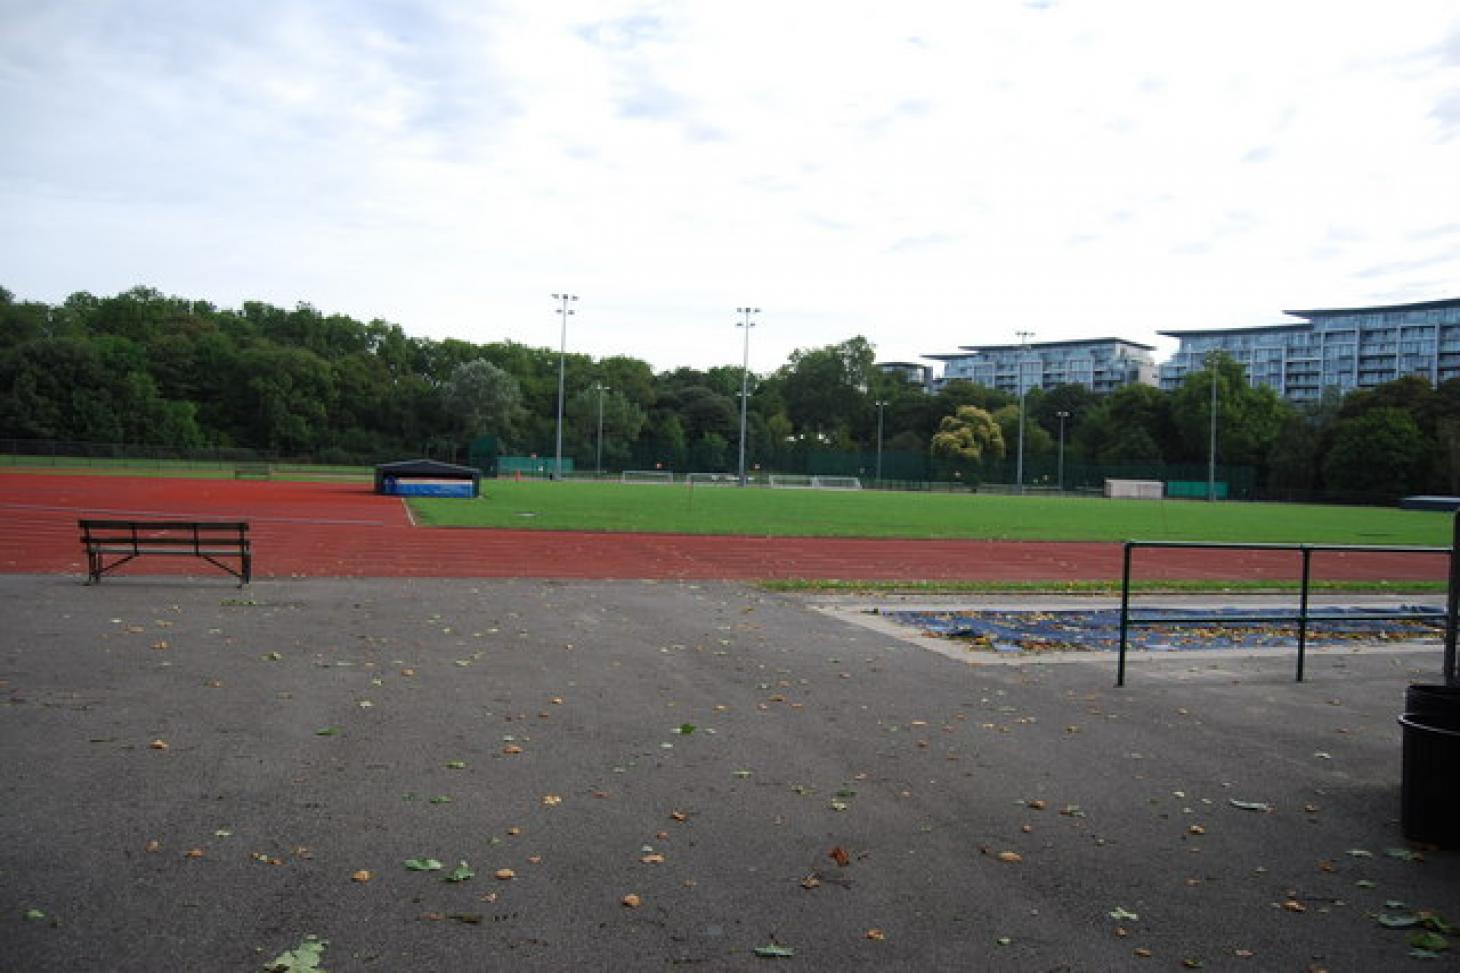 Battersea Park Millennium Arena Outdoor | Concrete netball court